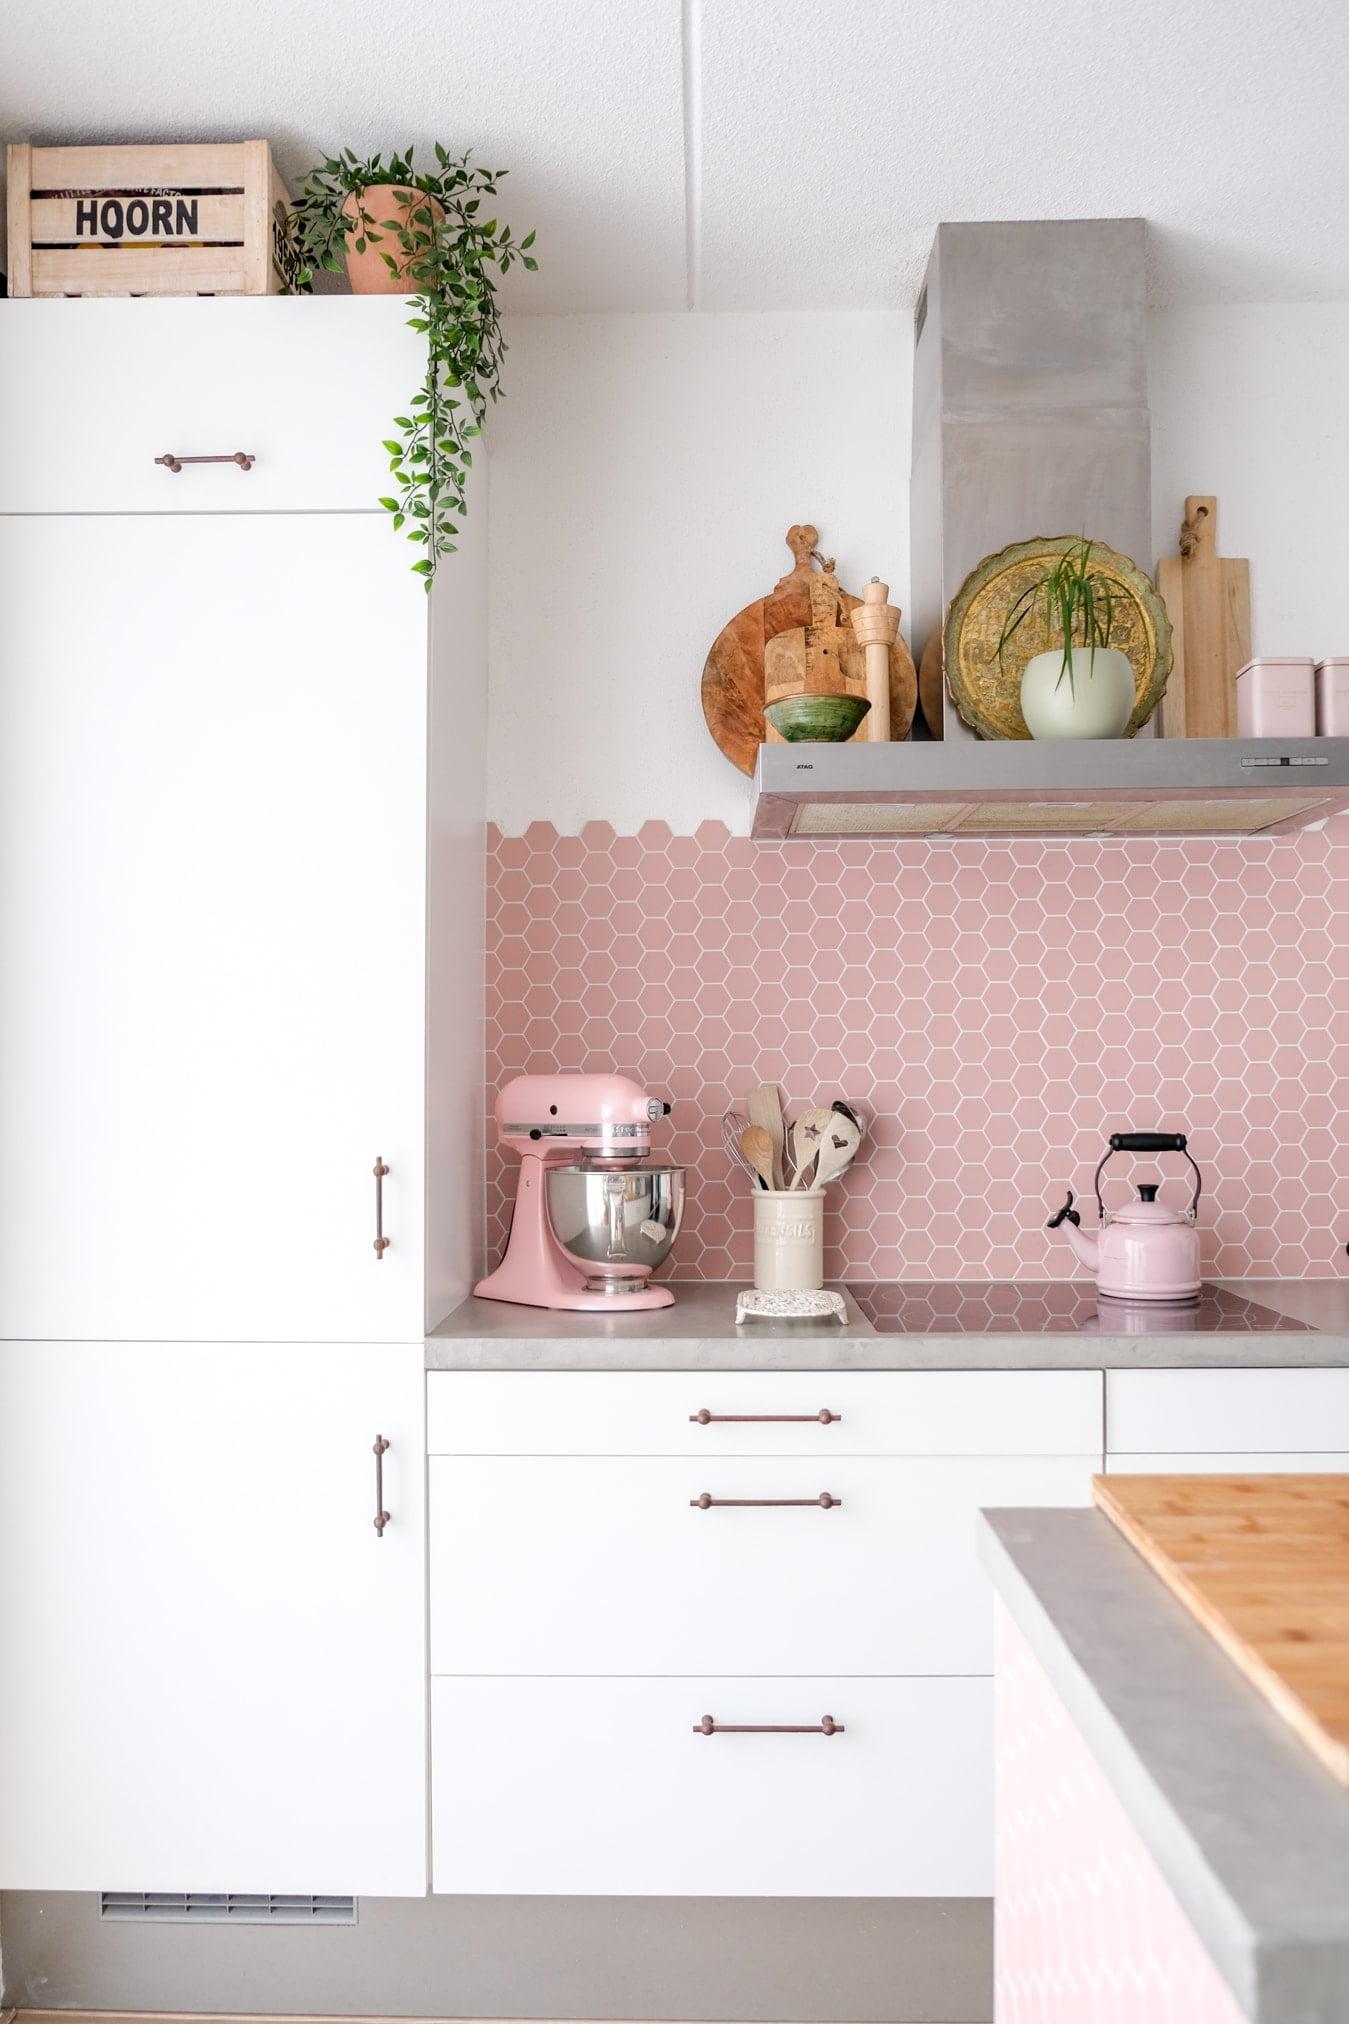 roestkleurige handvatten keukenkastjes